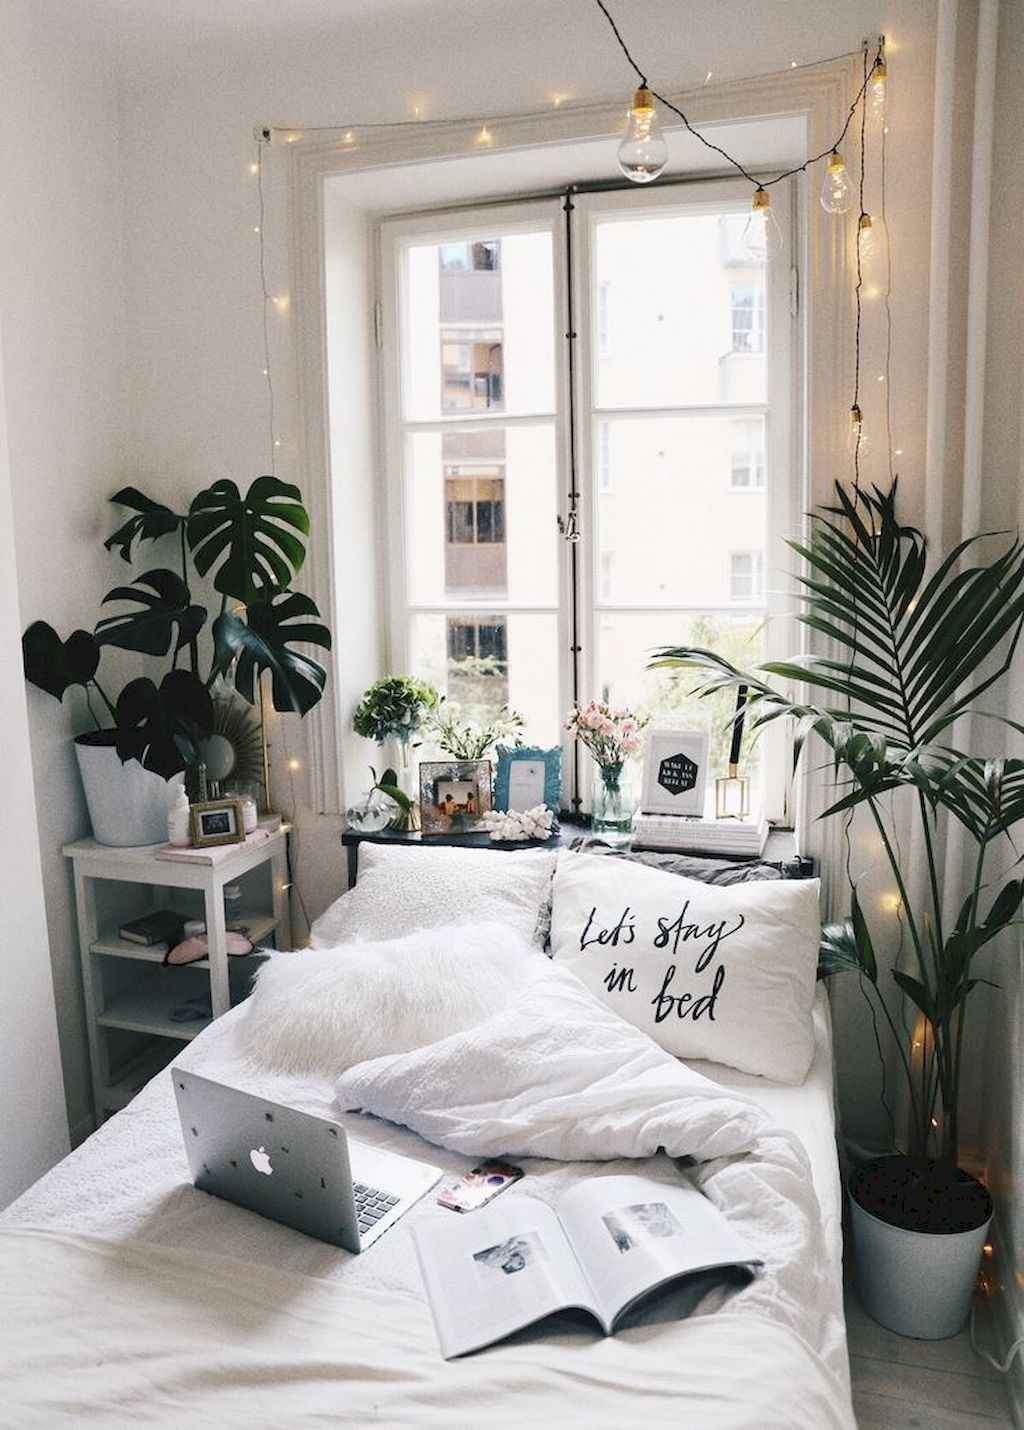 Cute diy dorm room decorating ideas on a budget (43)